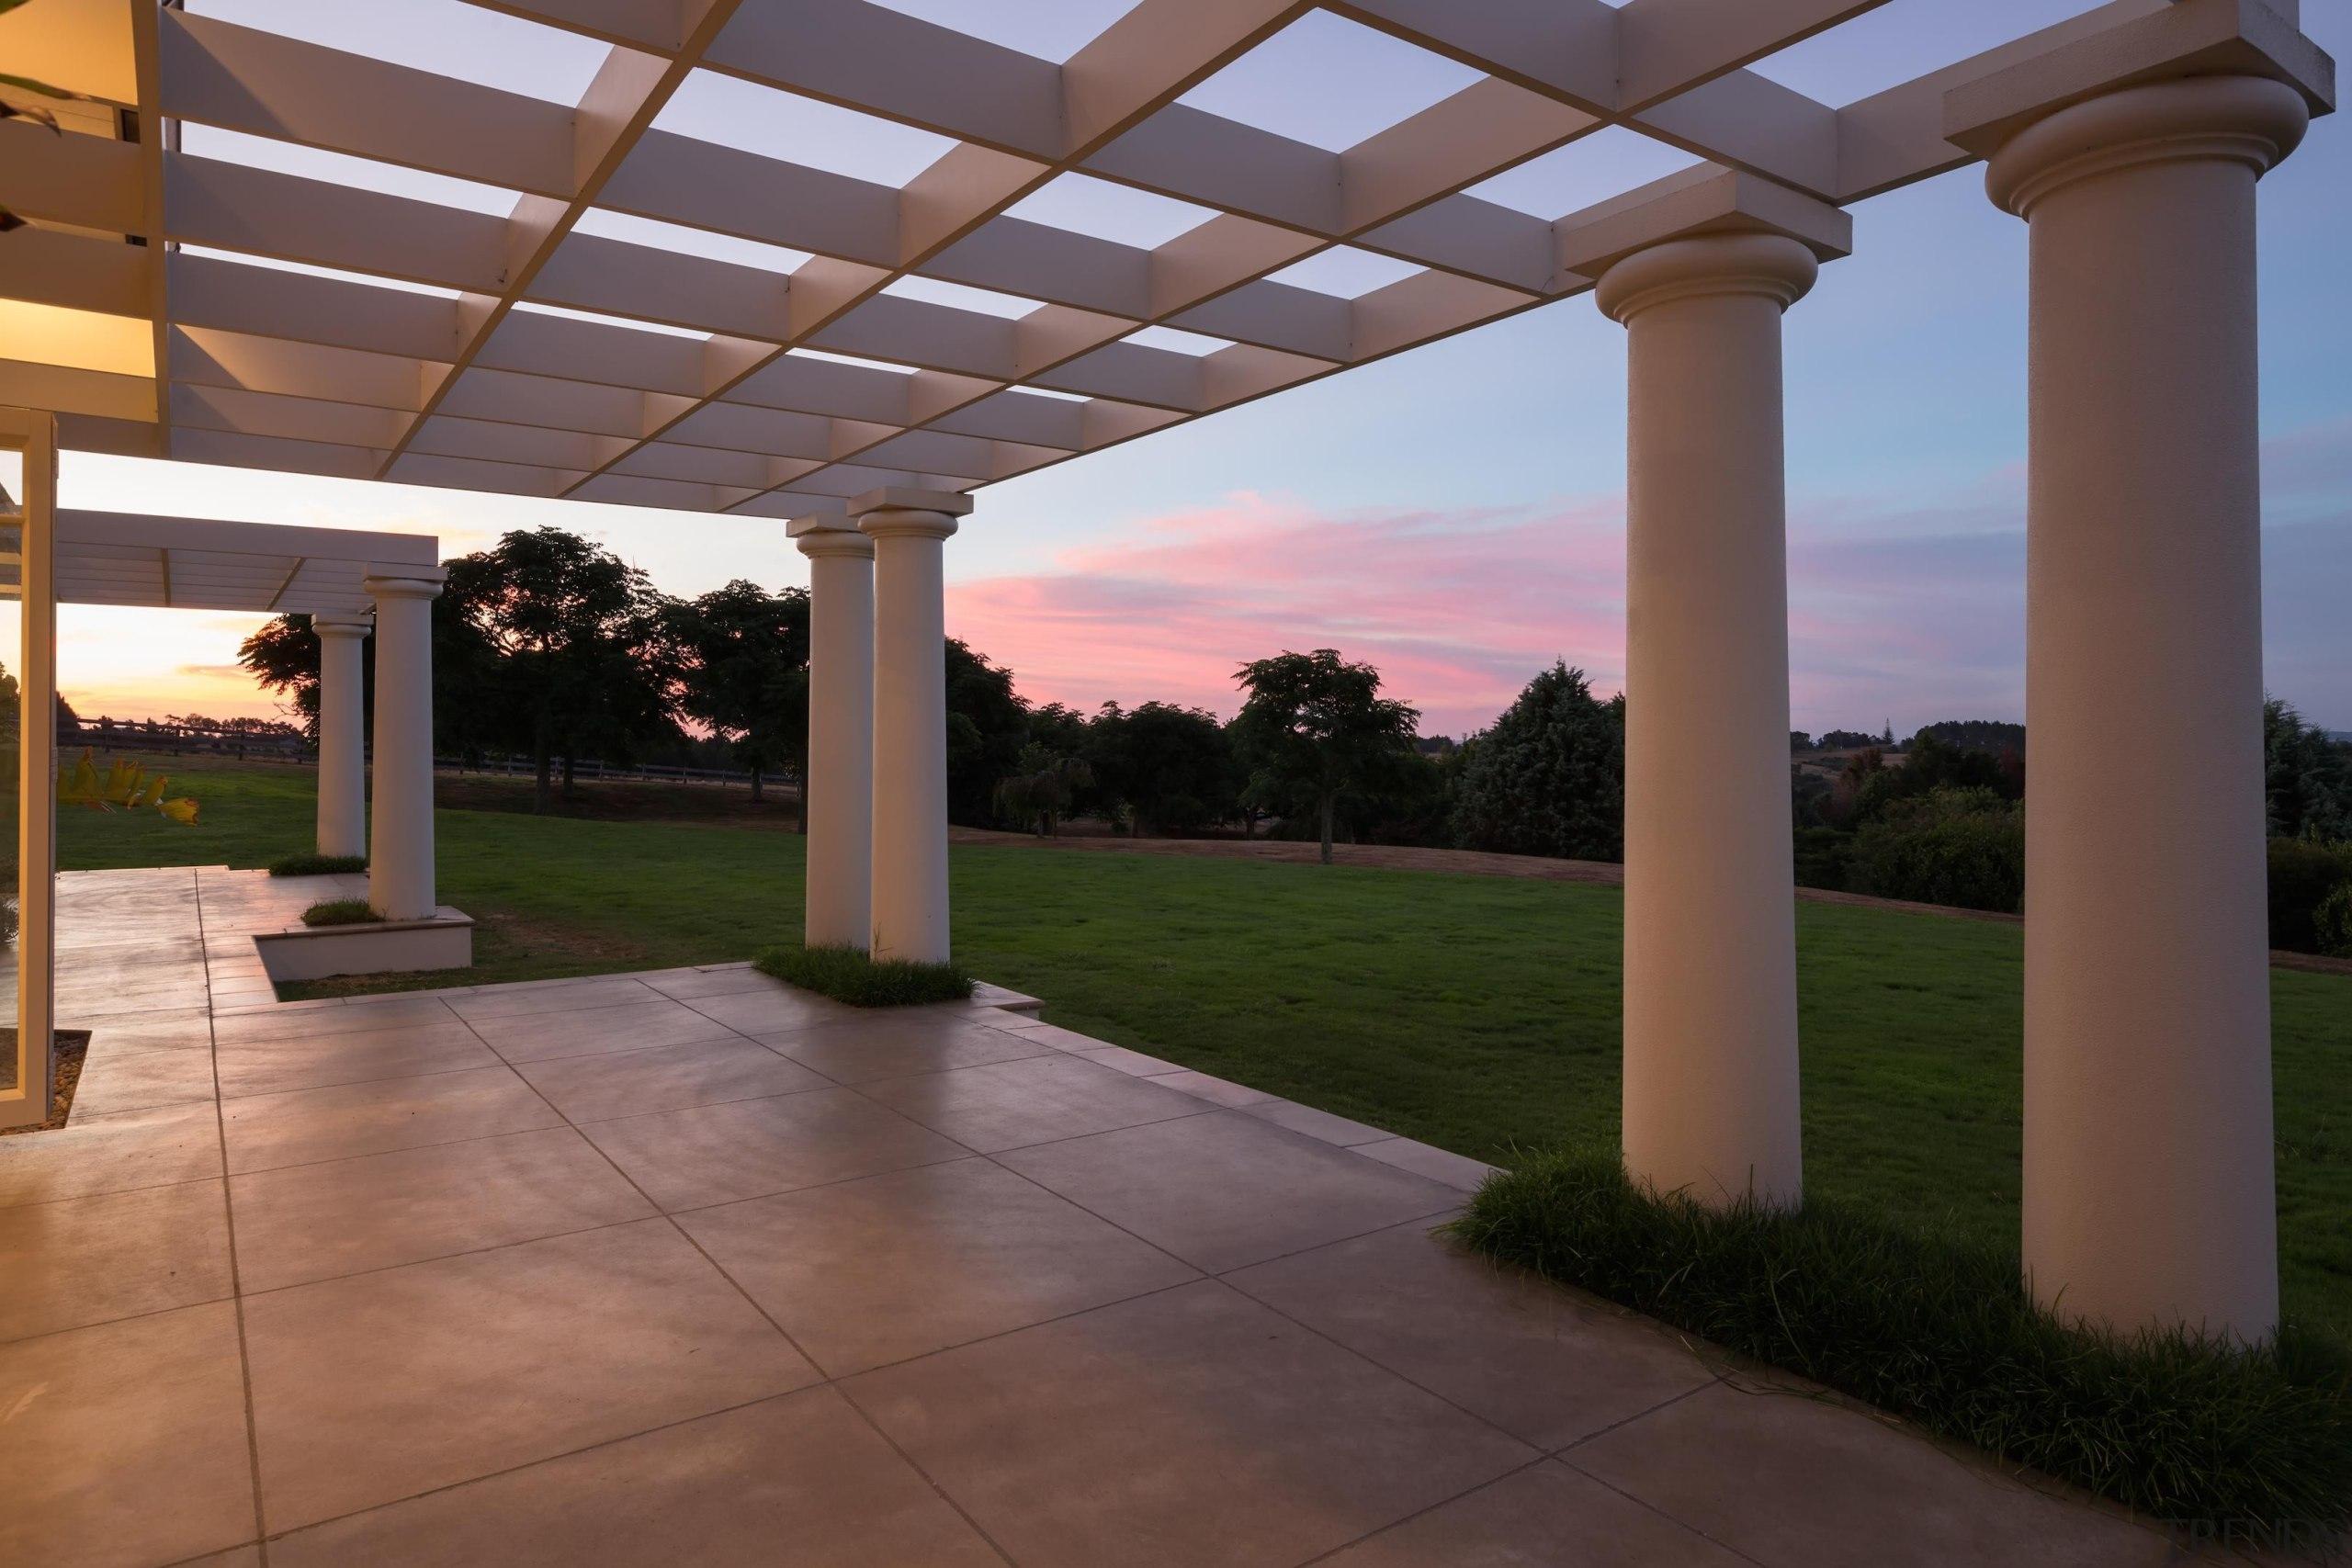 Whitford 3 - column | estate | hacienda column, estate, hacienda, outdoor structure, pergola, property, real estate, sky, structure, brown